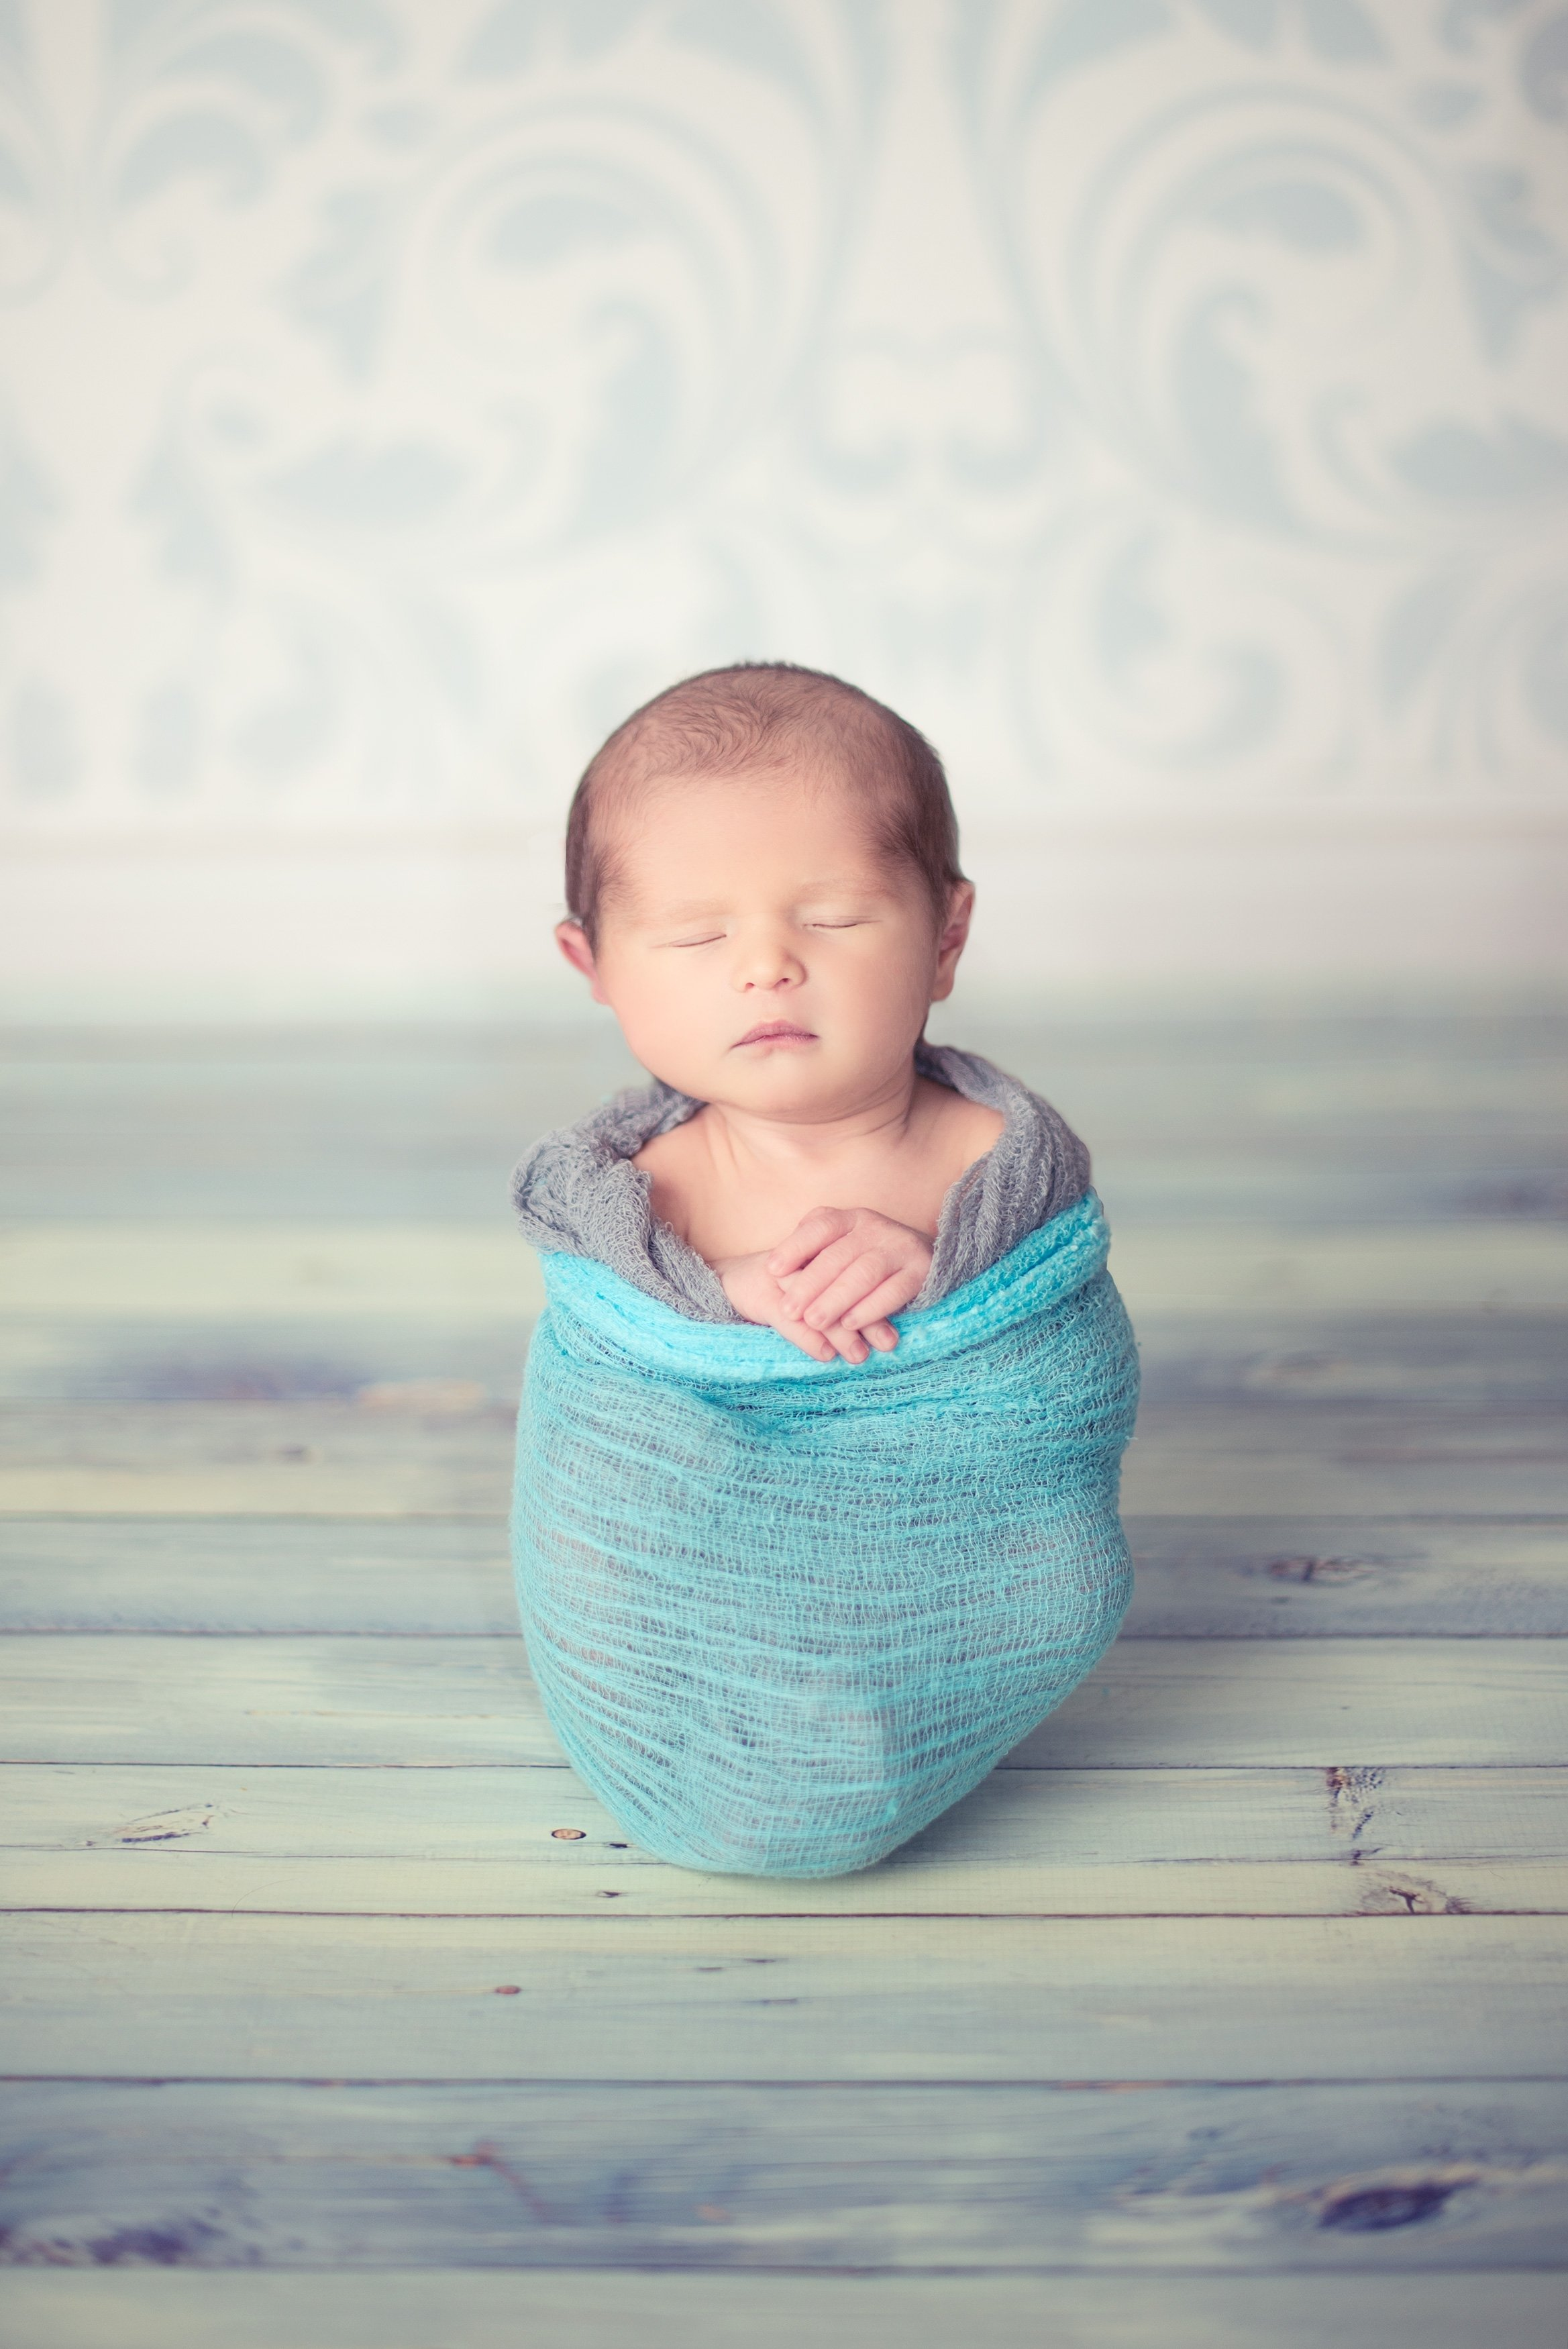 10 Stunning Baby Boy Photo Shoot Ideas baby boy creative photo shoot photographyjanellabellphoto photo 2021